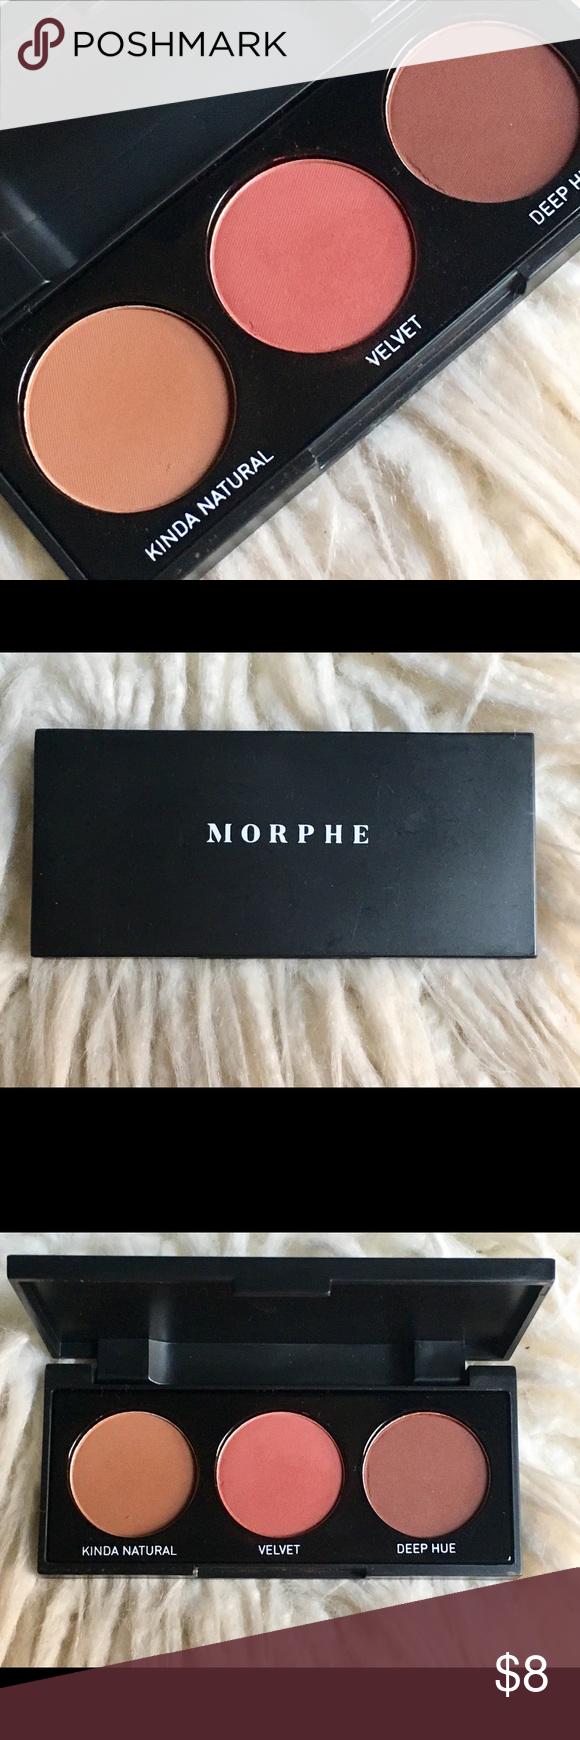 Pin on Morphe Cosmetics Makeup palettes